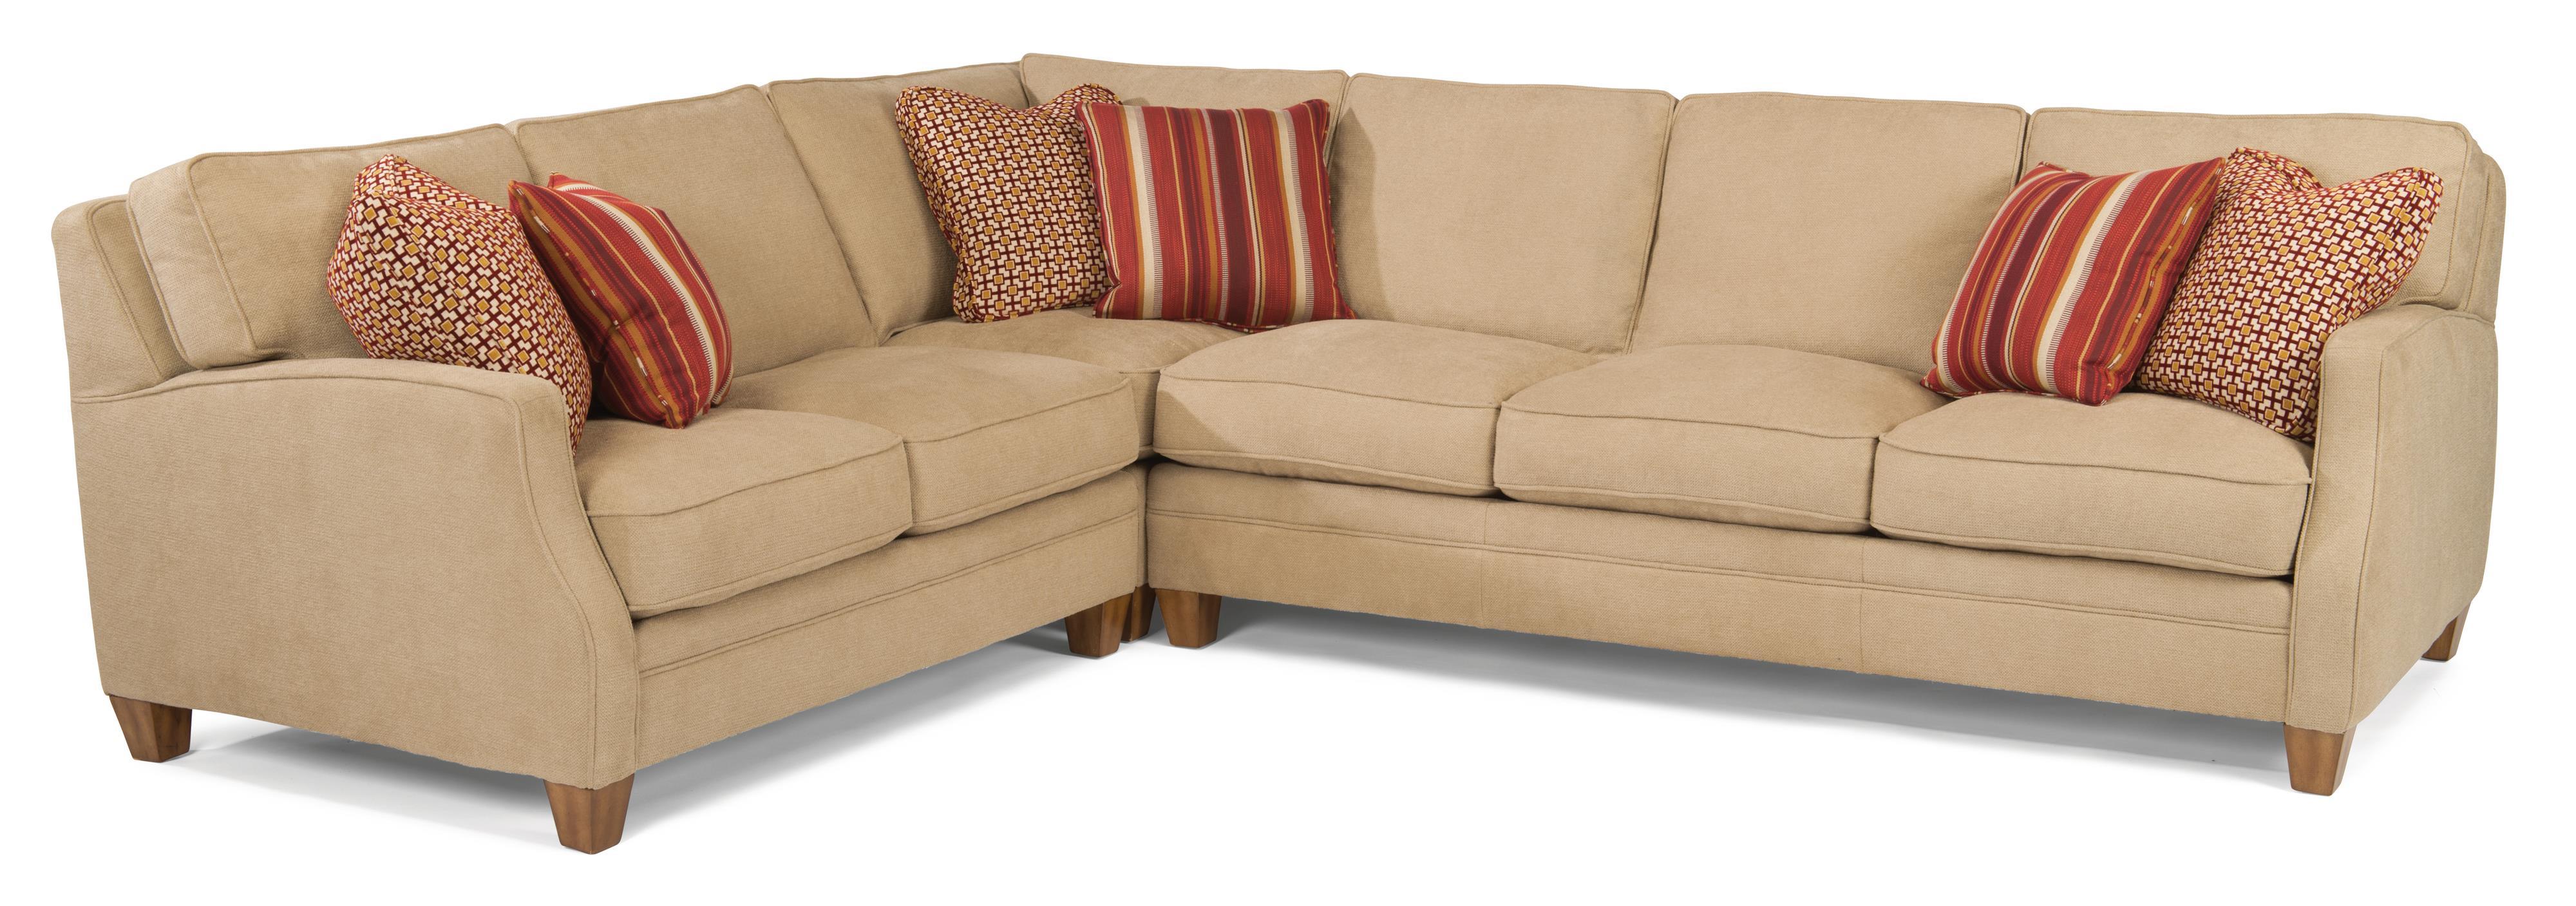 Lenox 3 Pc Sectional Sofa by Flexsteel at Jordan's Home Furnishings